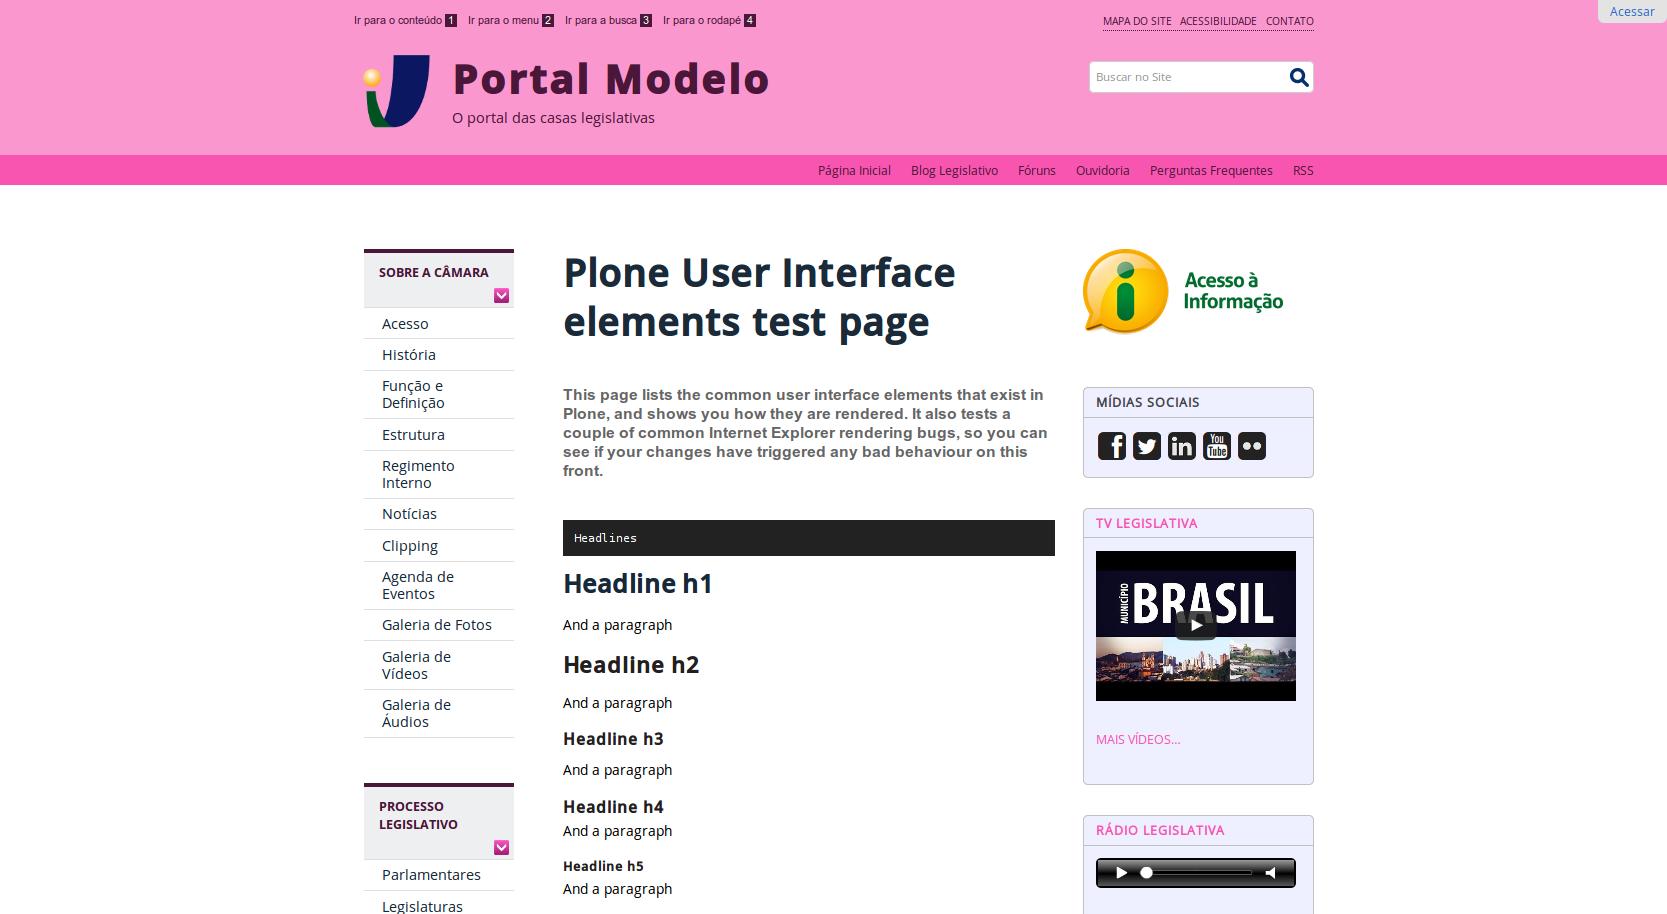 https://raw.githubusercontent.com/interlegis/interlegis.portalmodelo.theme/master/src/interlegis/portalmodelo/theme/themes/IDG-rosa/preview.png